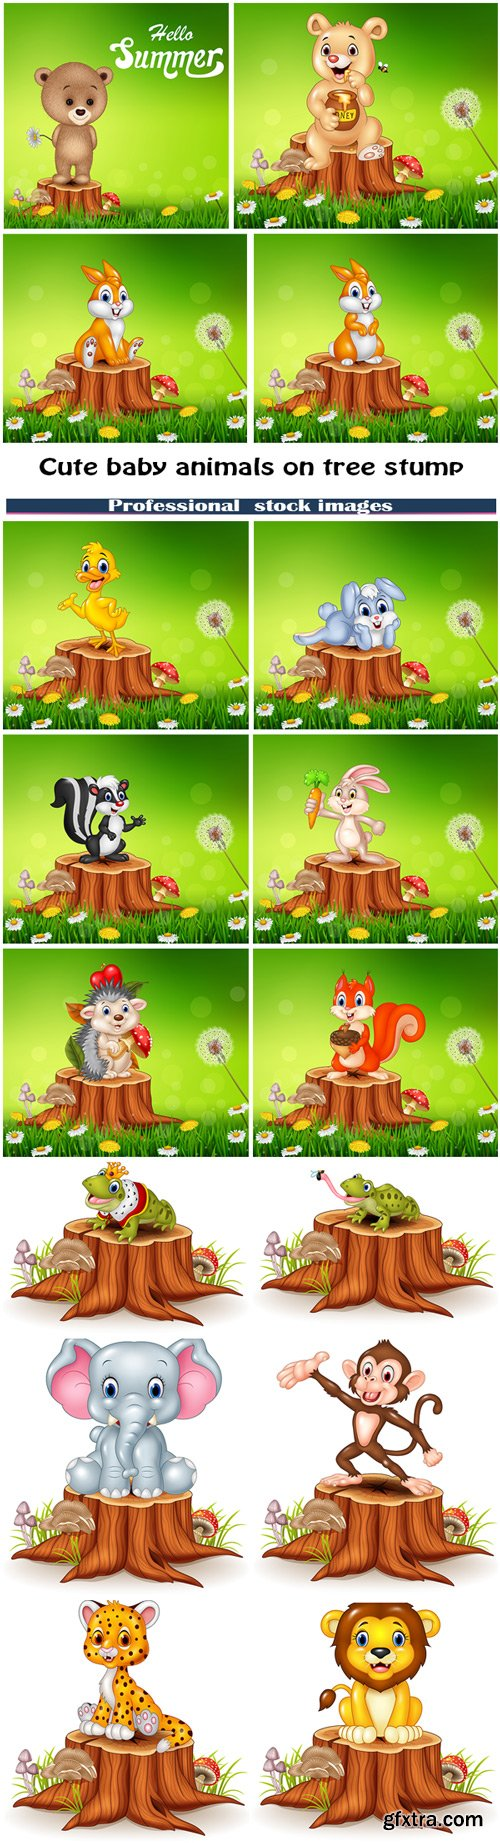 Cute baby animals on tree stump